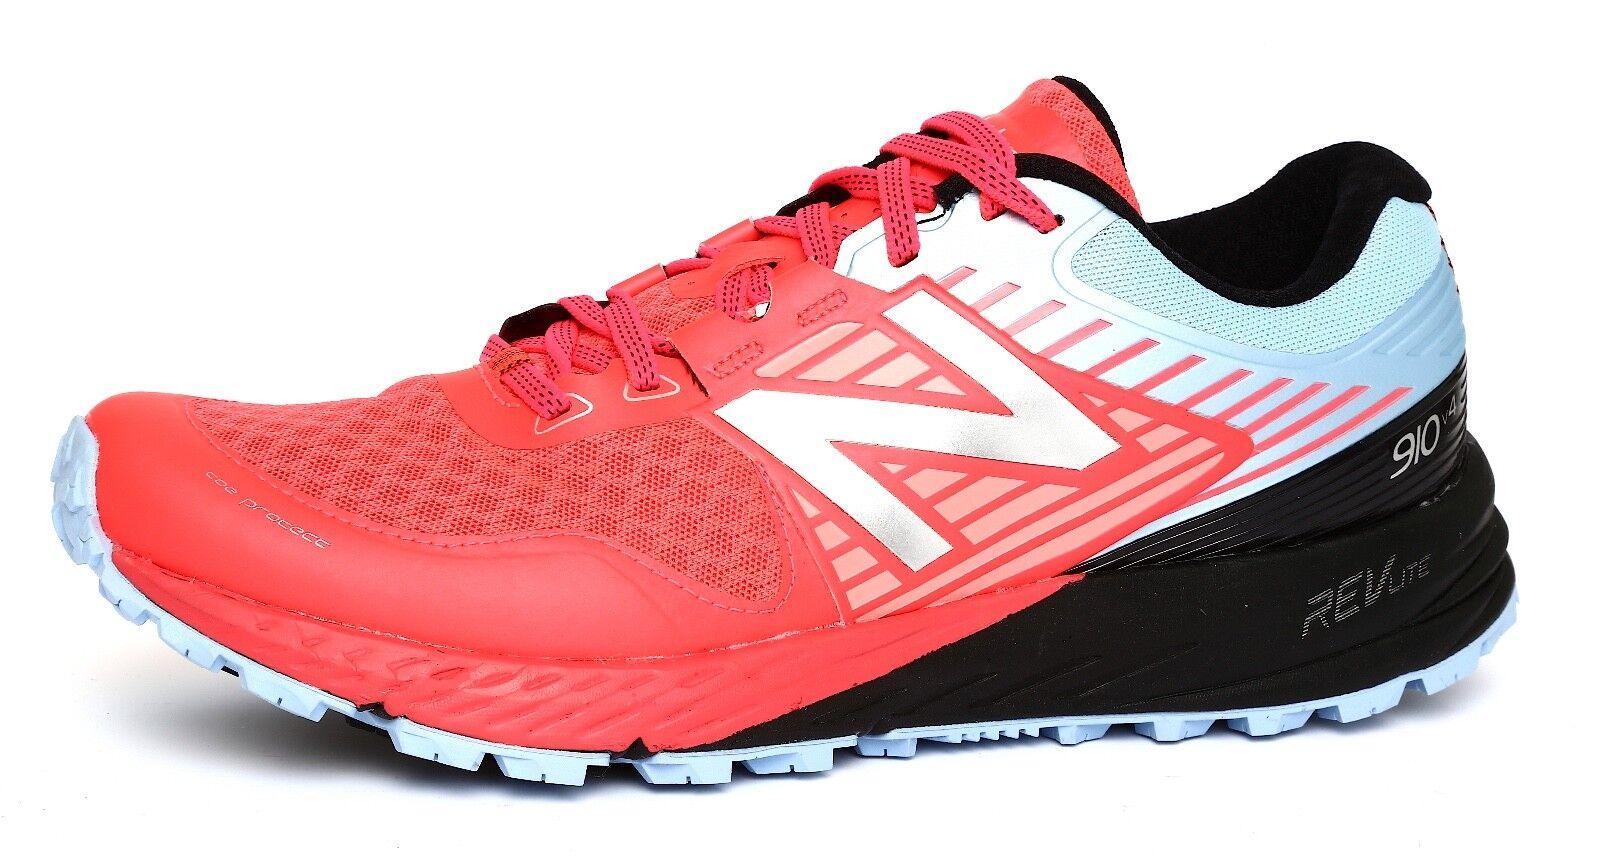 New Balance 910v4 Trail Femme Vivid Coral Running Chaussures Sz 11B 4655